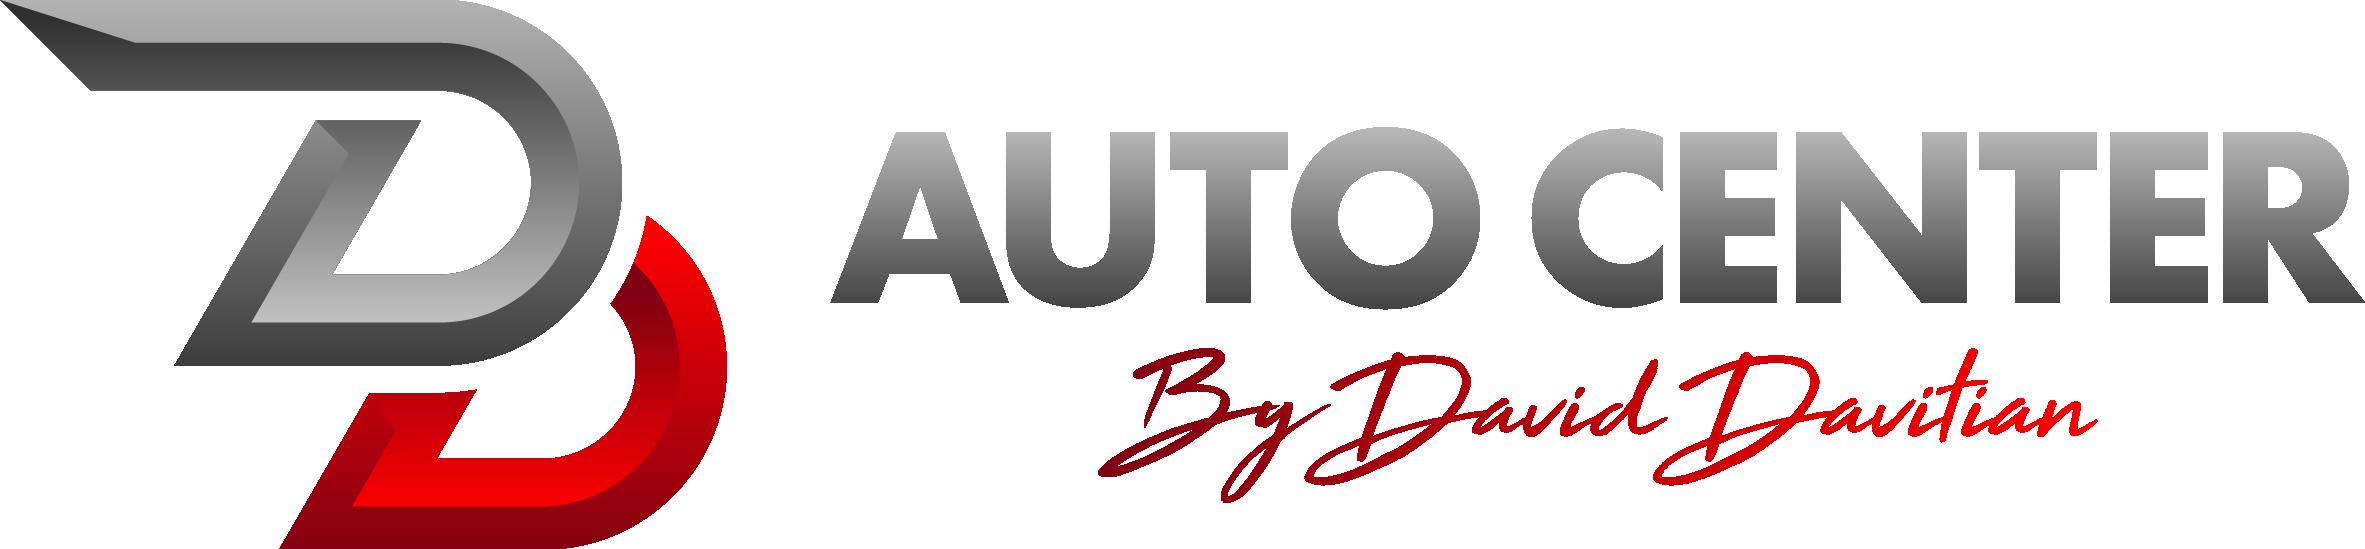 DD Autocenter